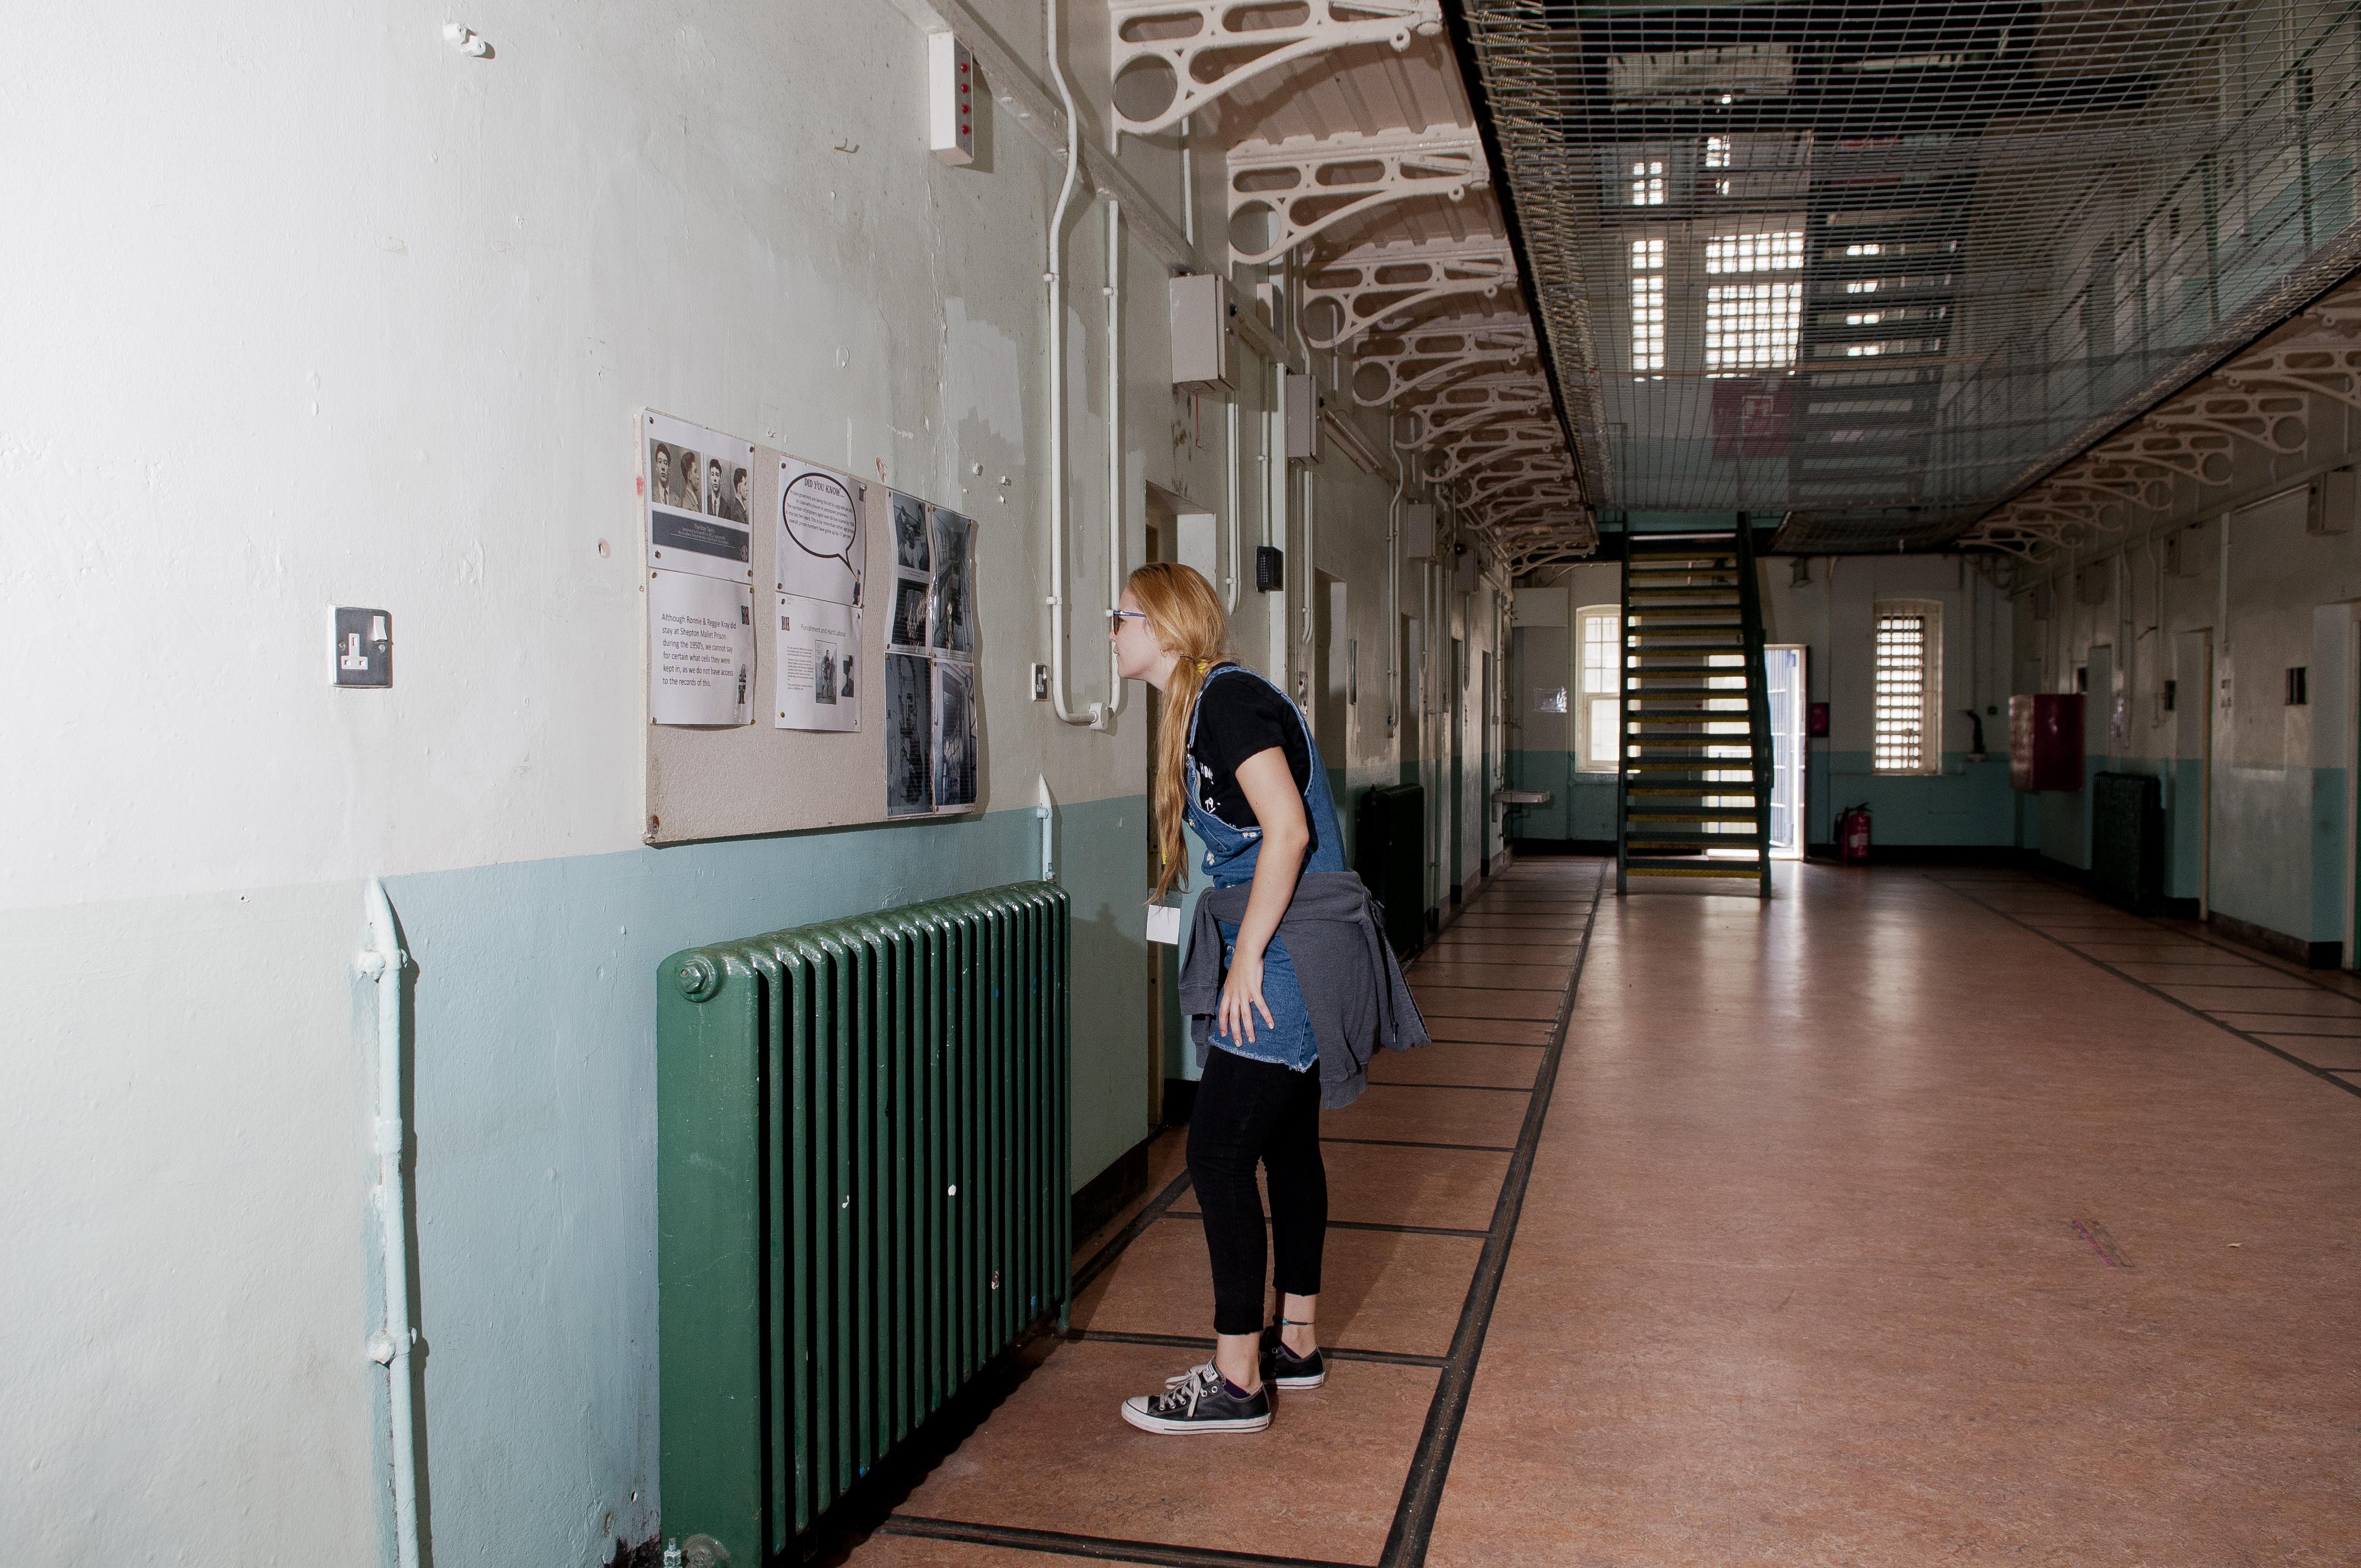 at Shepton Mallet Prison